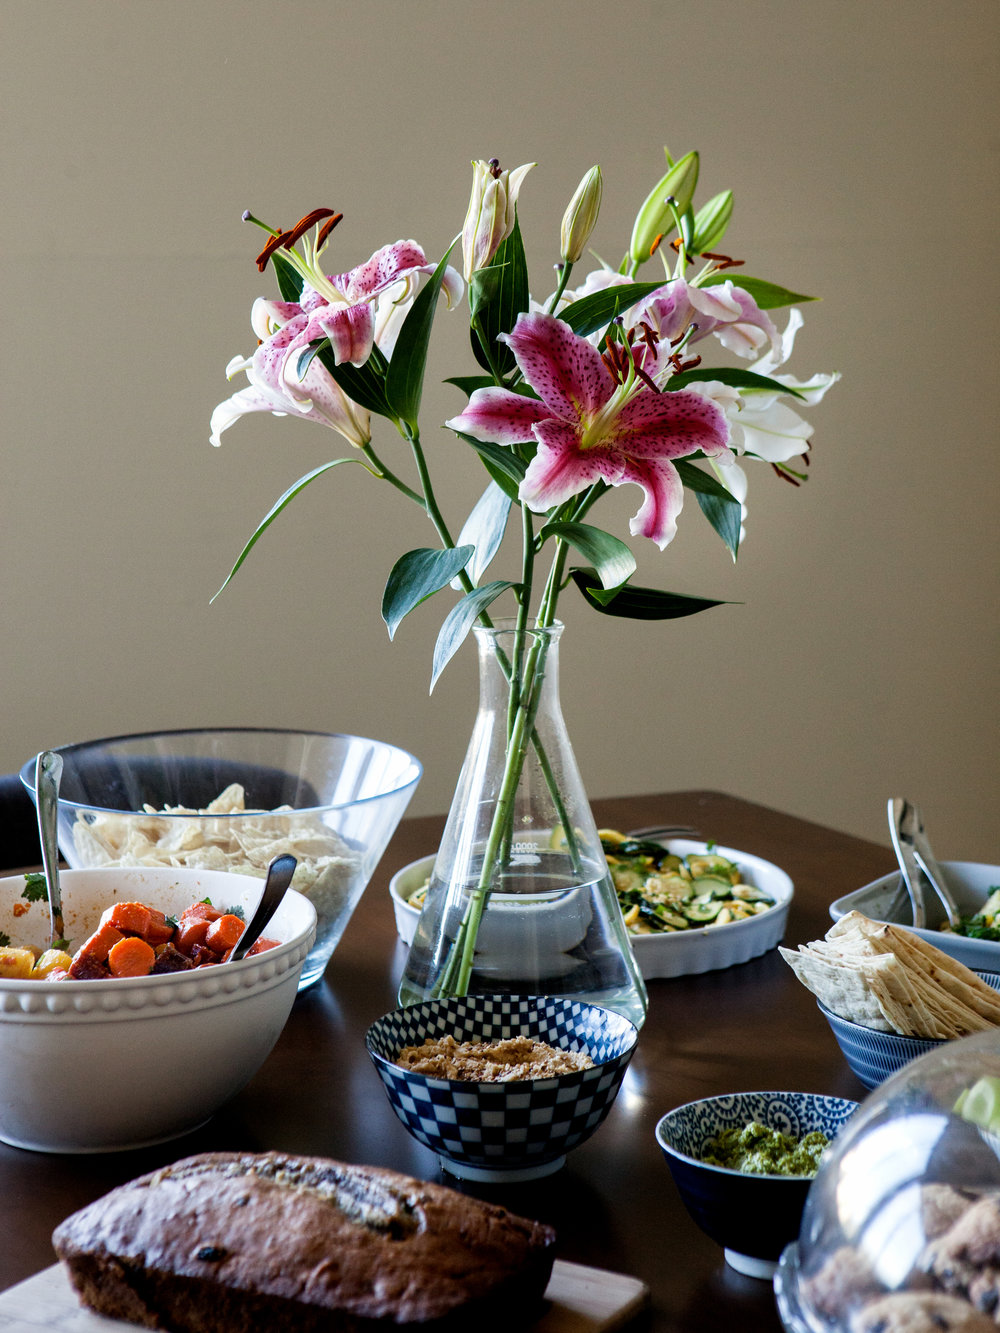 LA065_VictoireLouapre_FoodCritics_DinnerParty_MG_6194.jpg